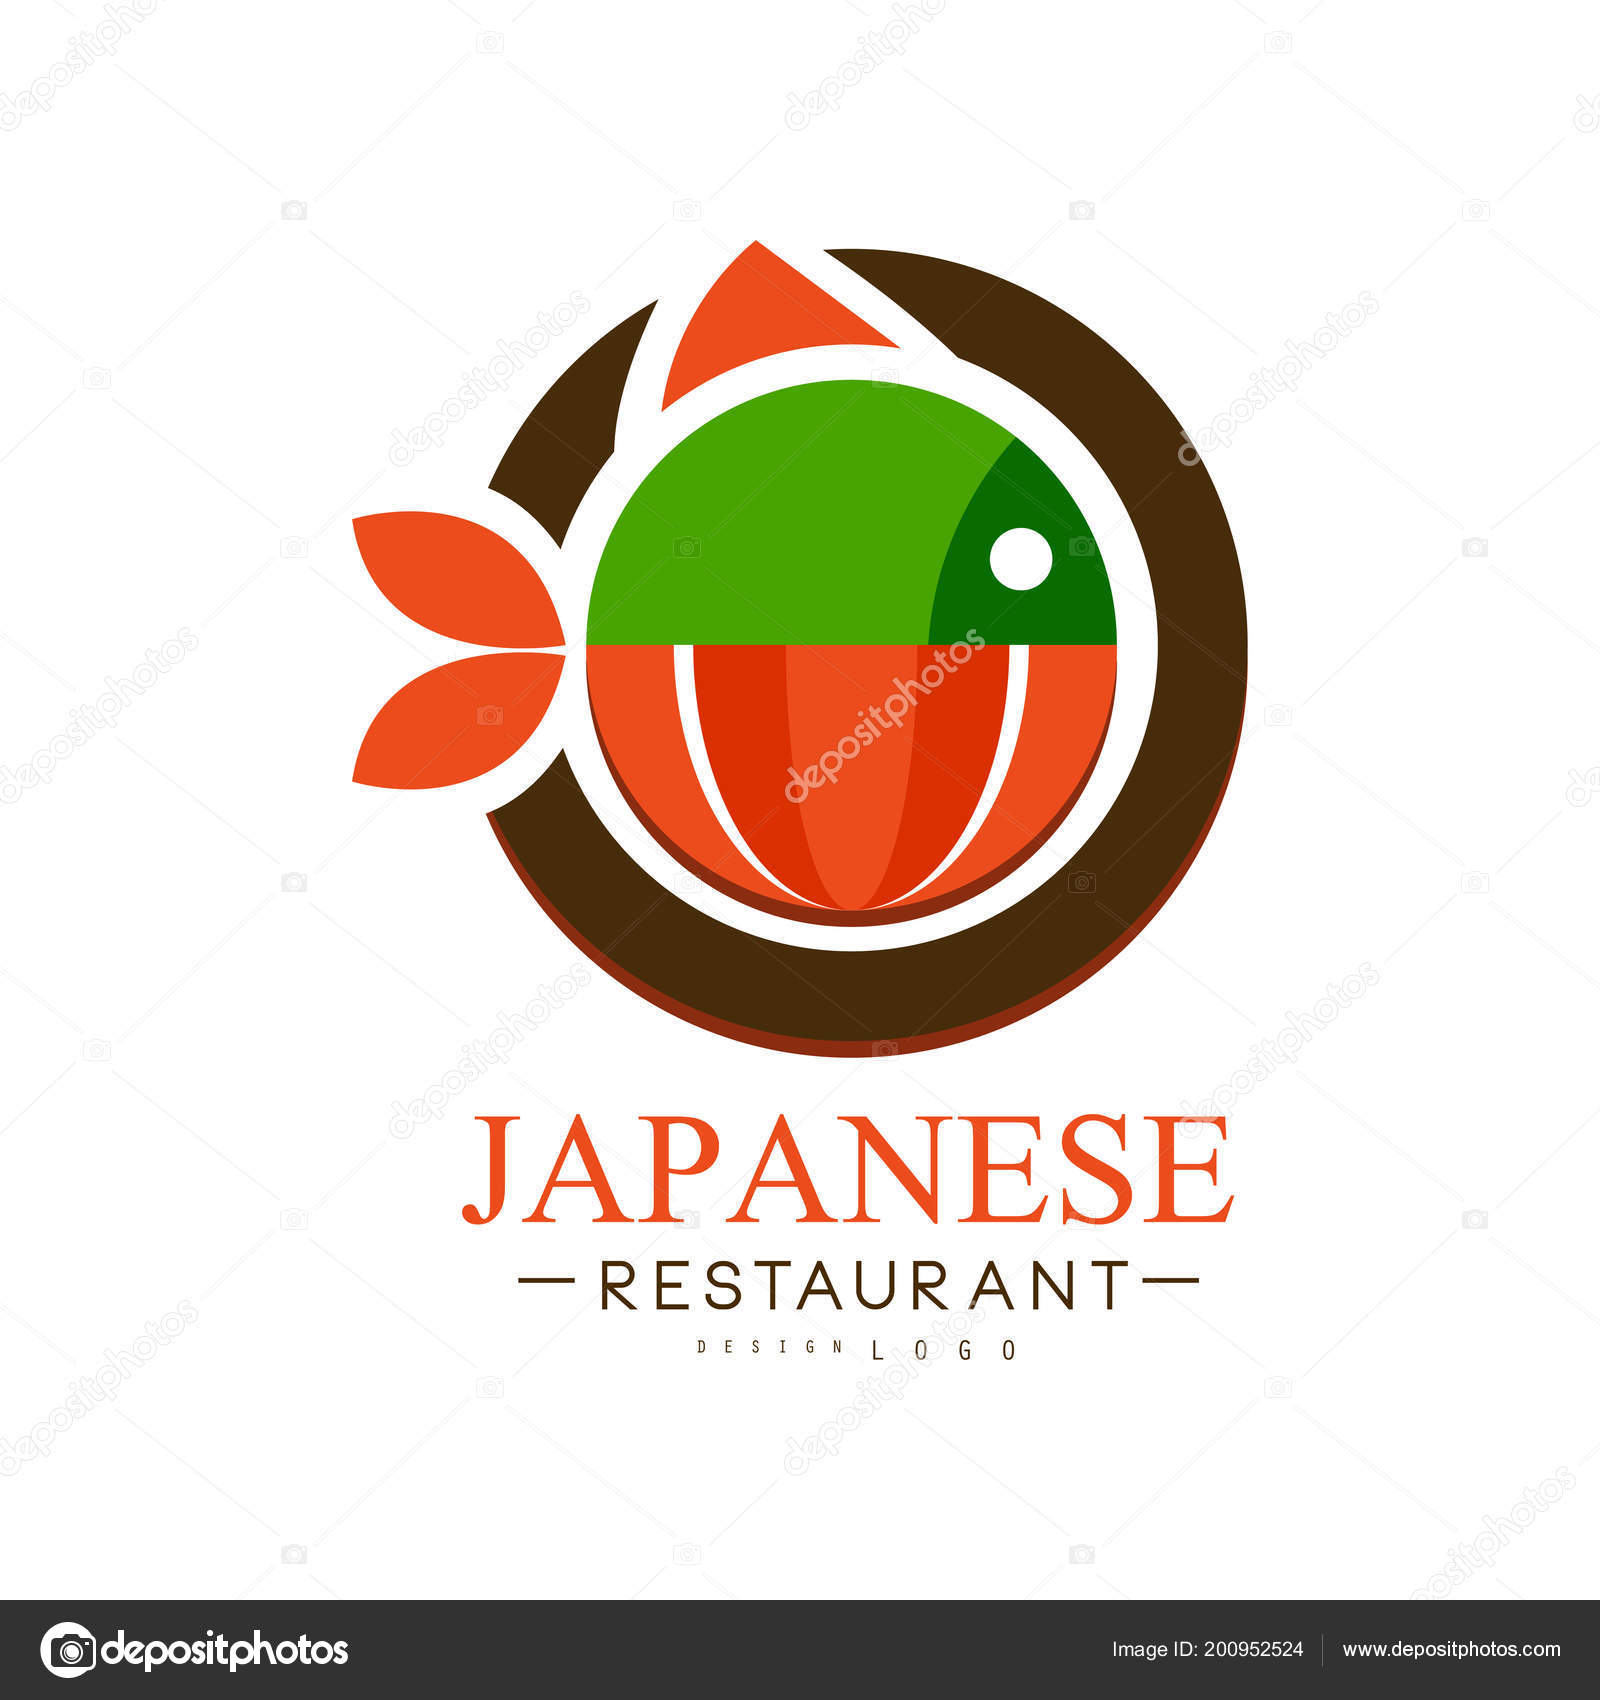 Japanese restaurant logo design, authentic traditional